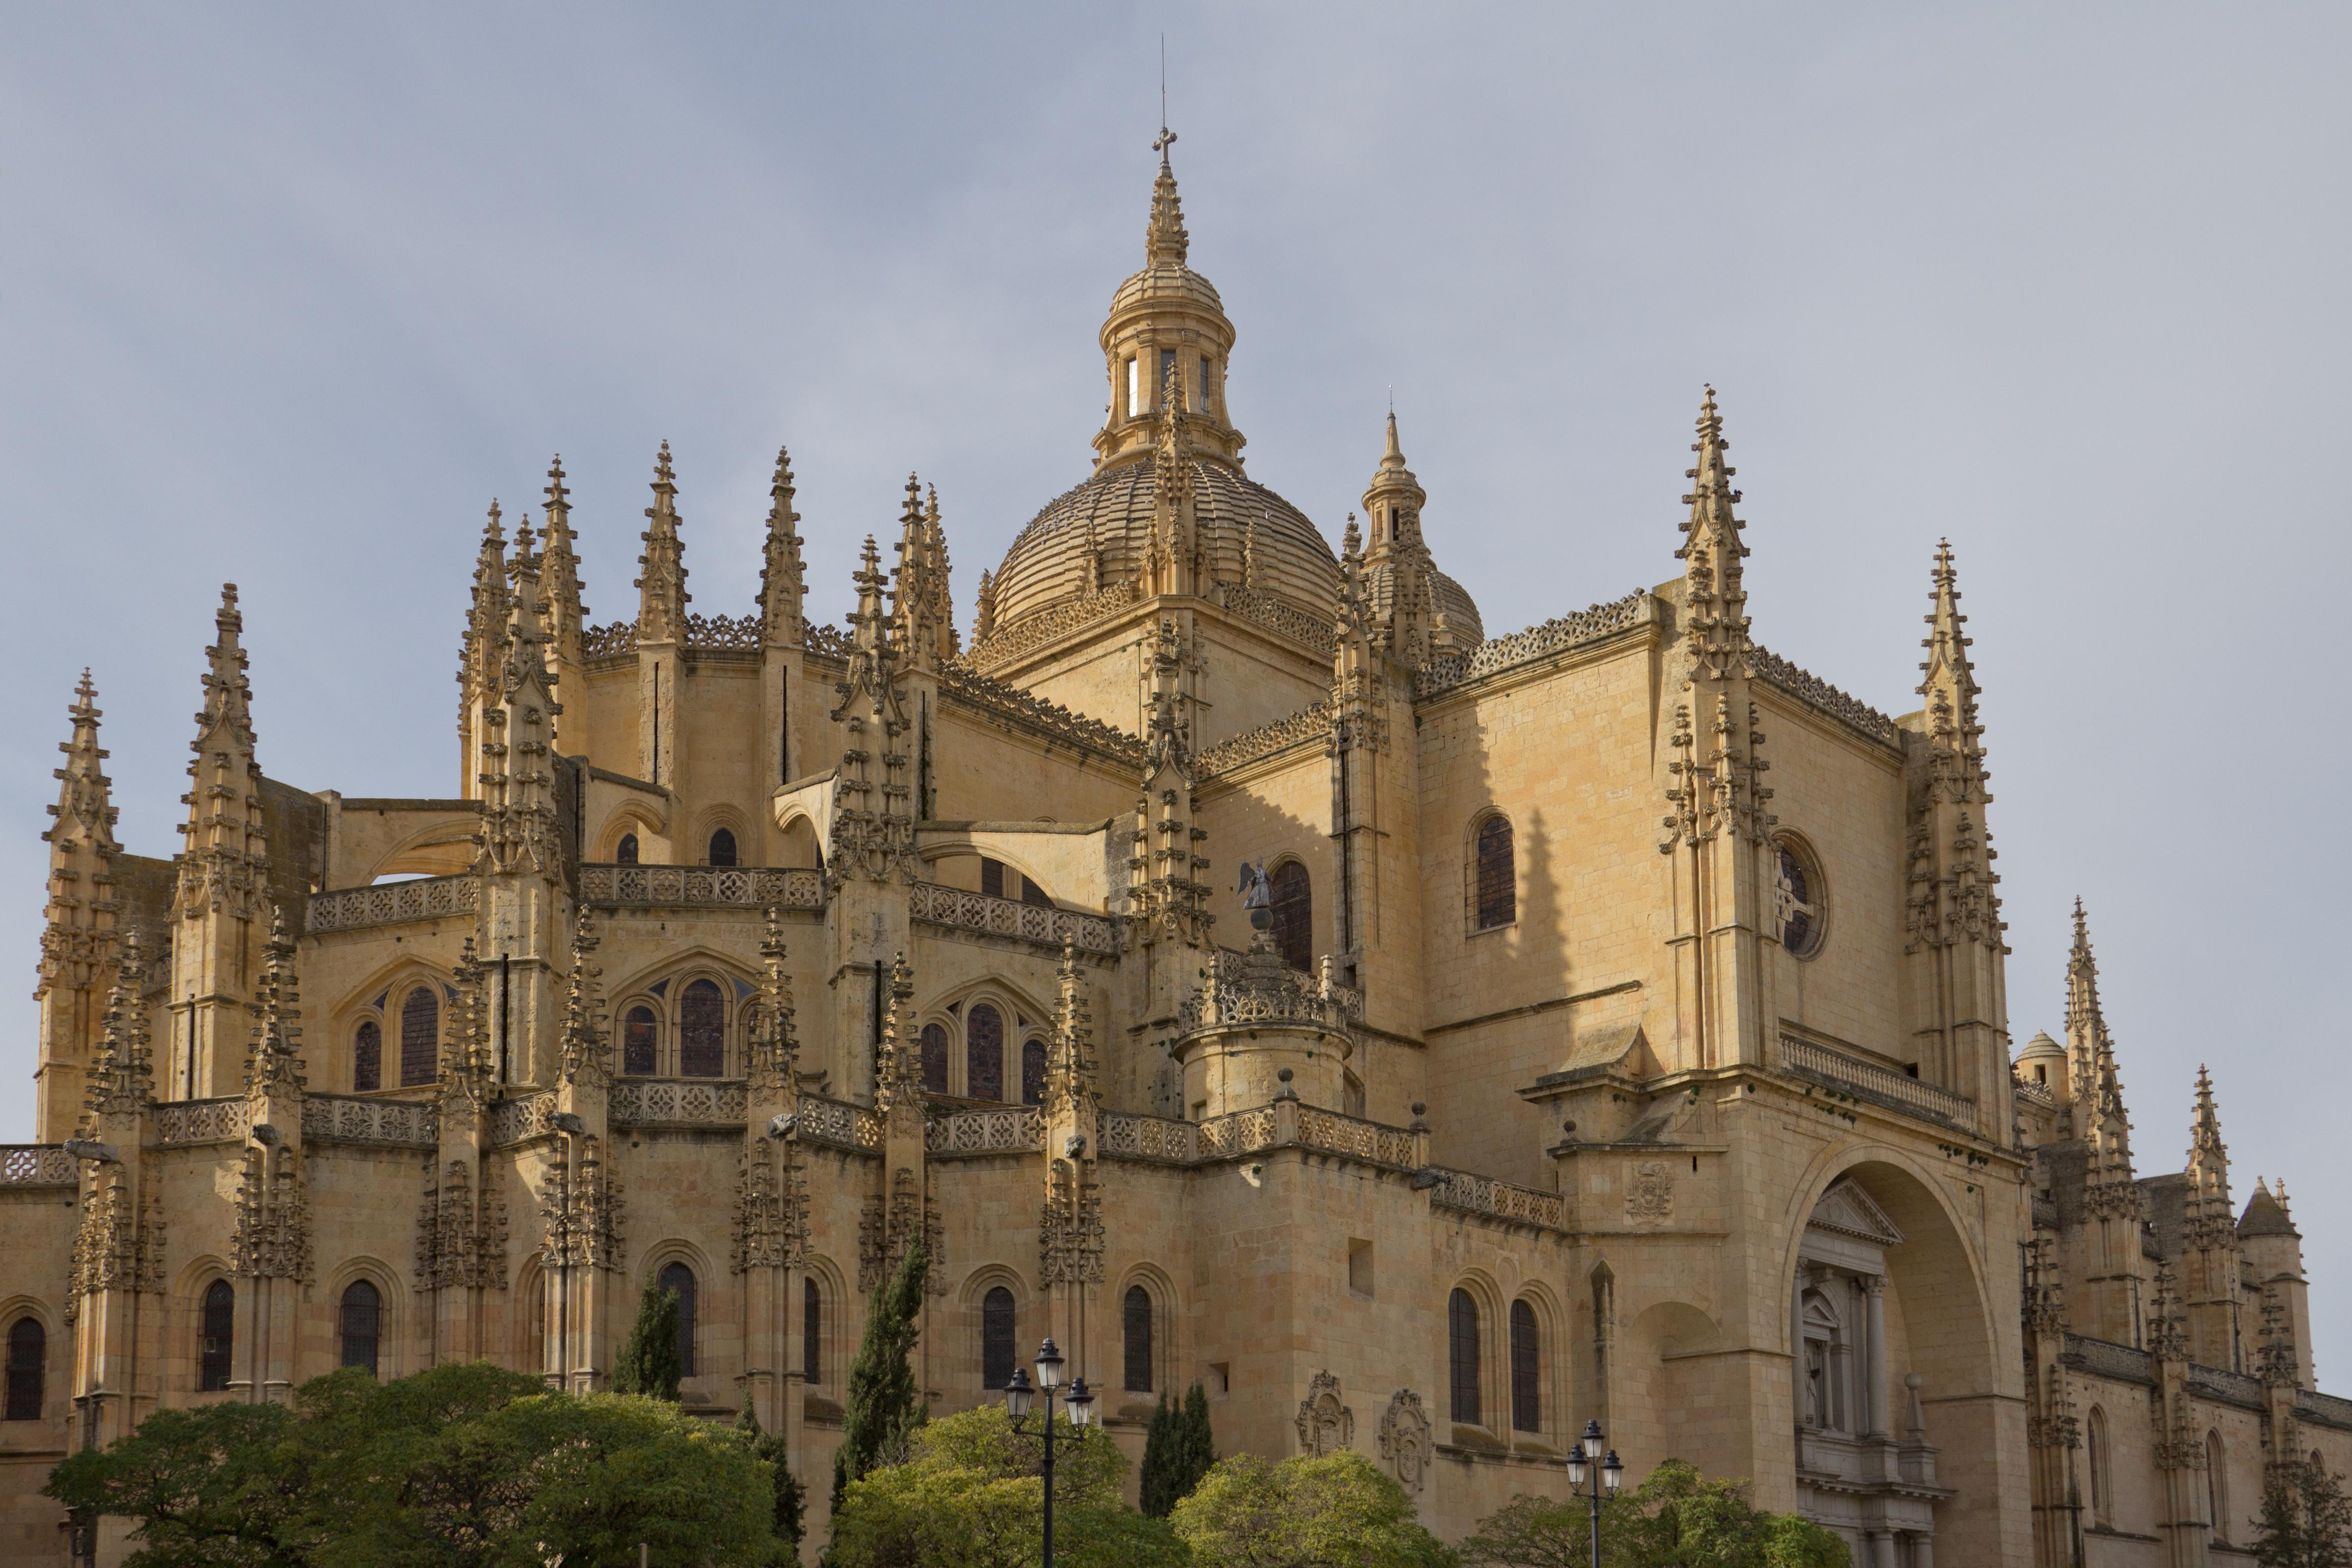 File:Catedral de Santa María de Segovia - 04.jpg - Wikimedia Commons: https://commons.wikimedia.org/wiki/File:Catedral_de_Santa_María_de...